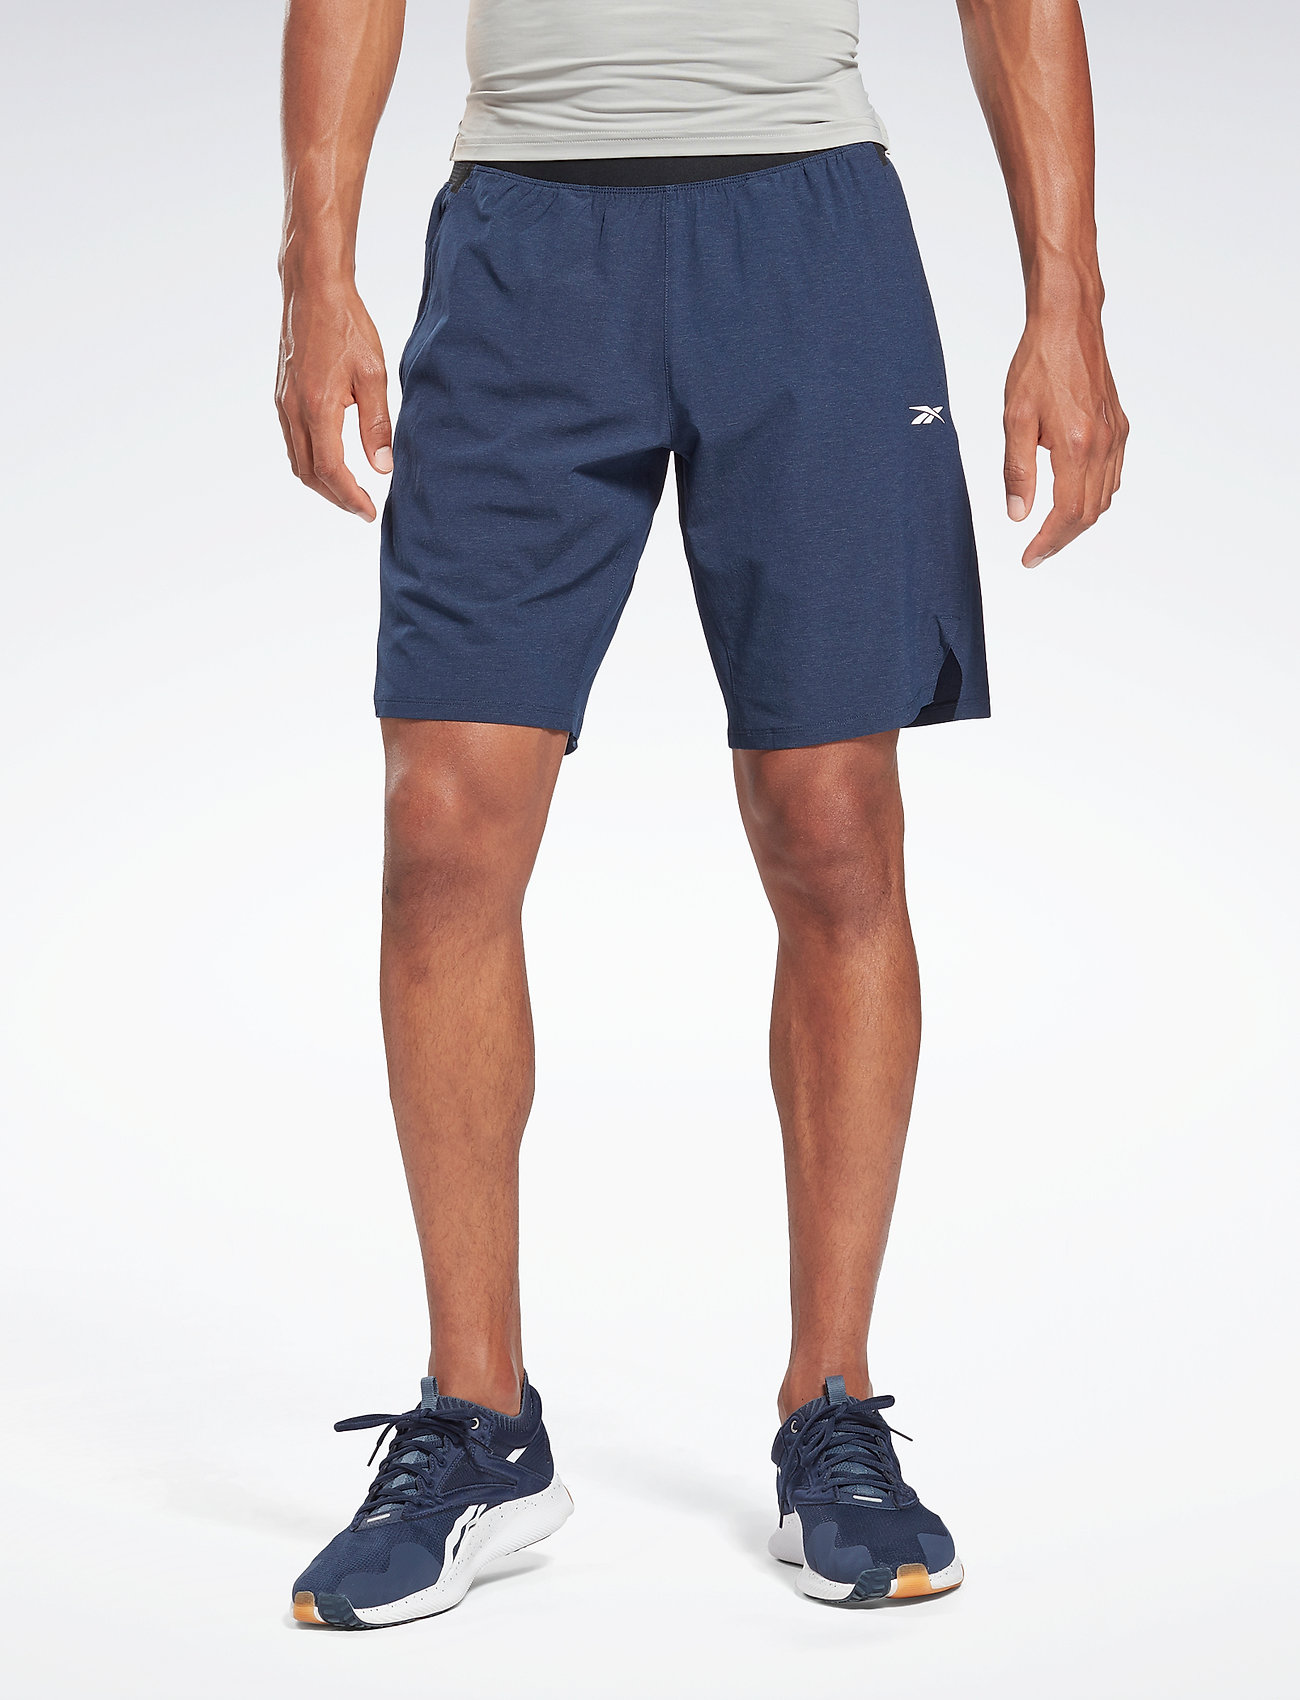 Reebok Performance - Epic Shorts - training korte broek - vecnav - 0